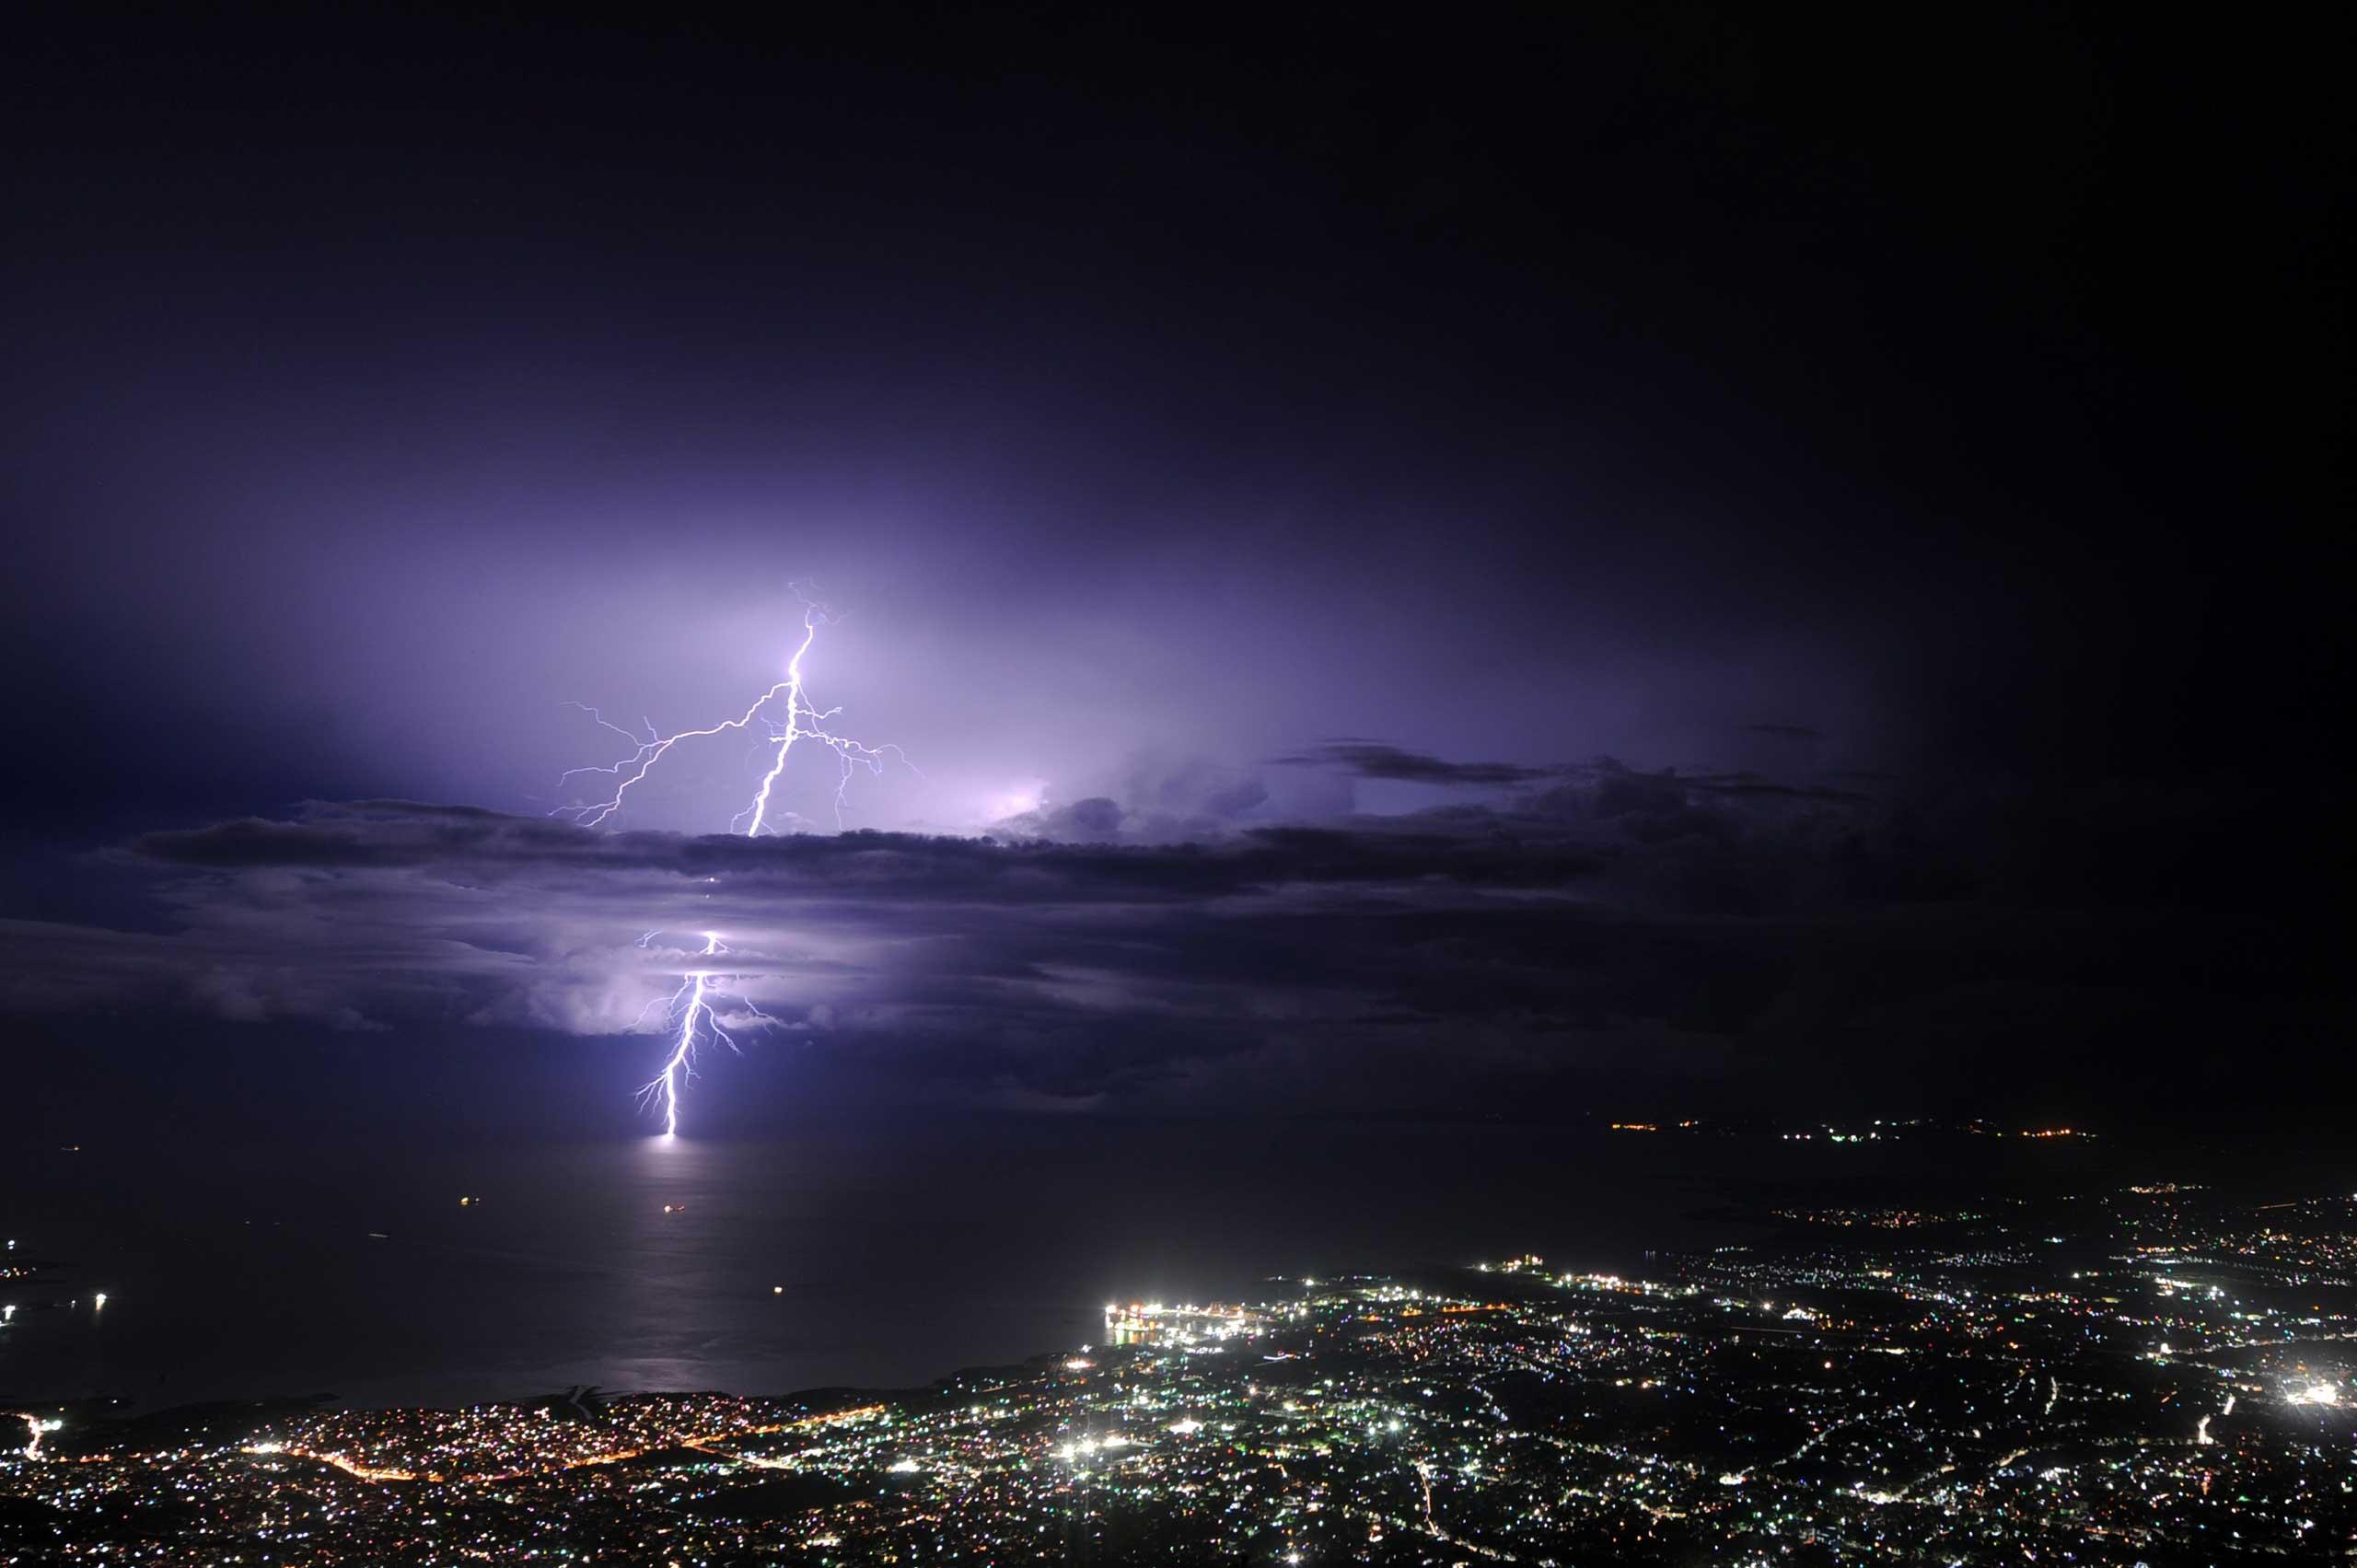 Sept. 24, 2014. Lightning strikes over the sea along the coast of the Haitian capital, Port au Prince.